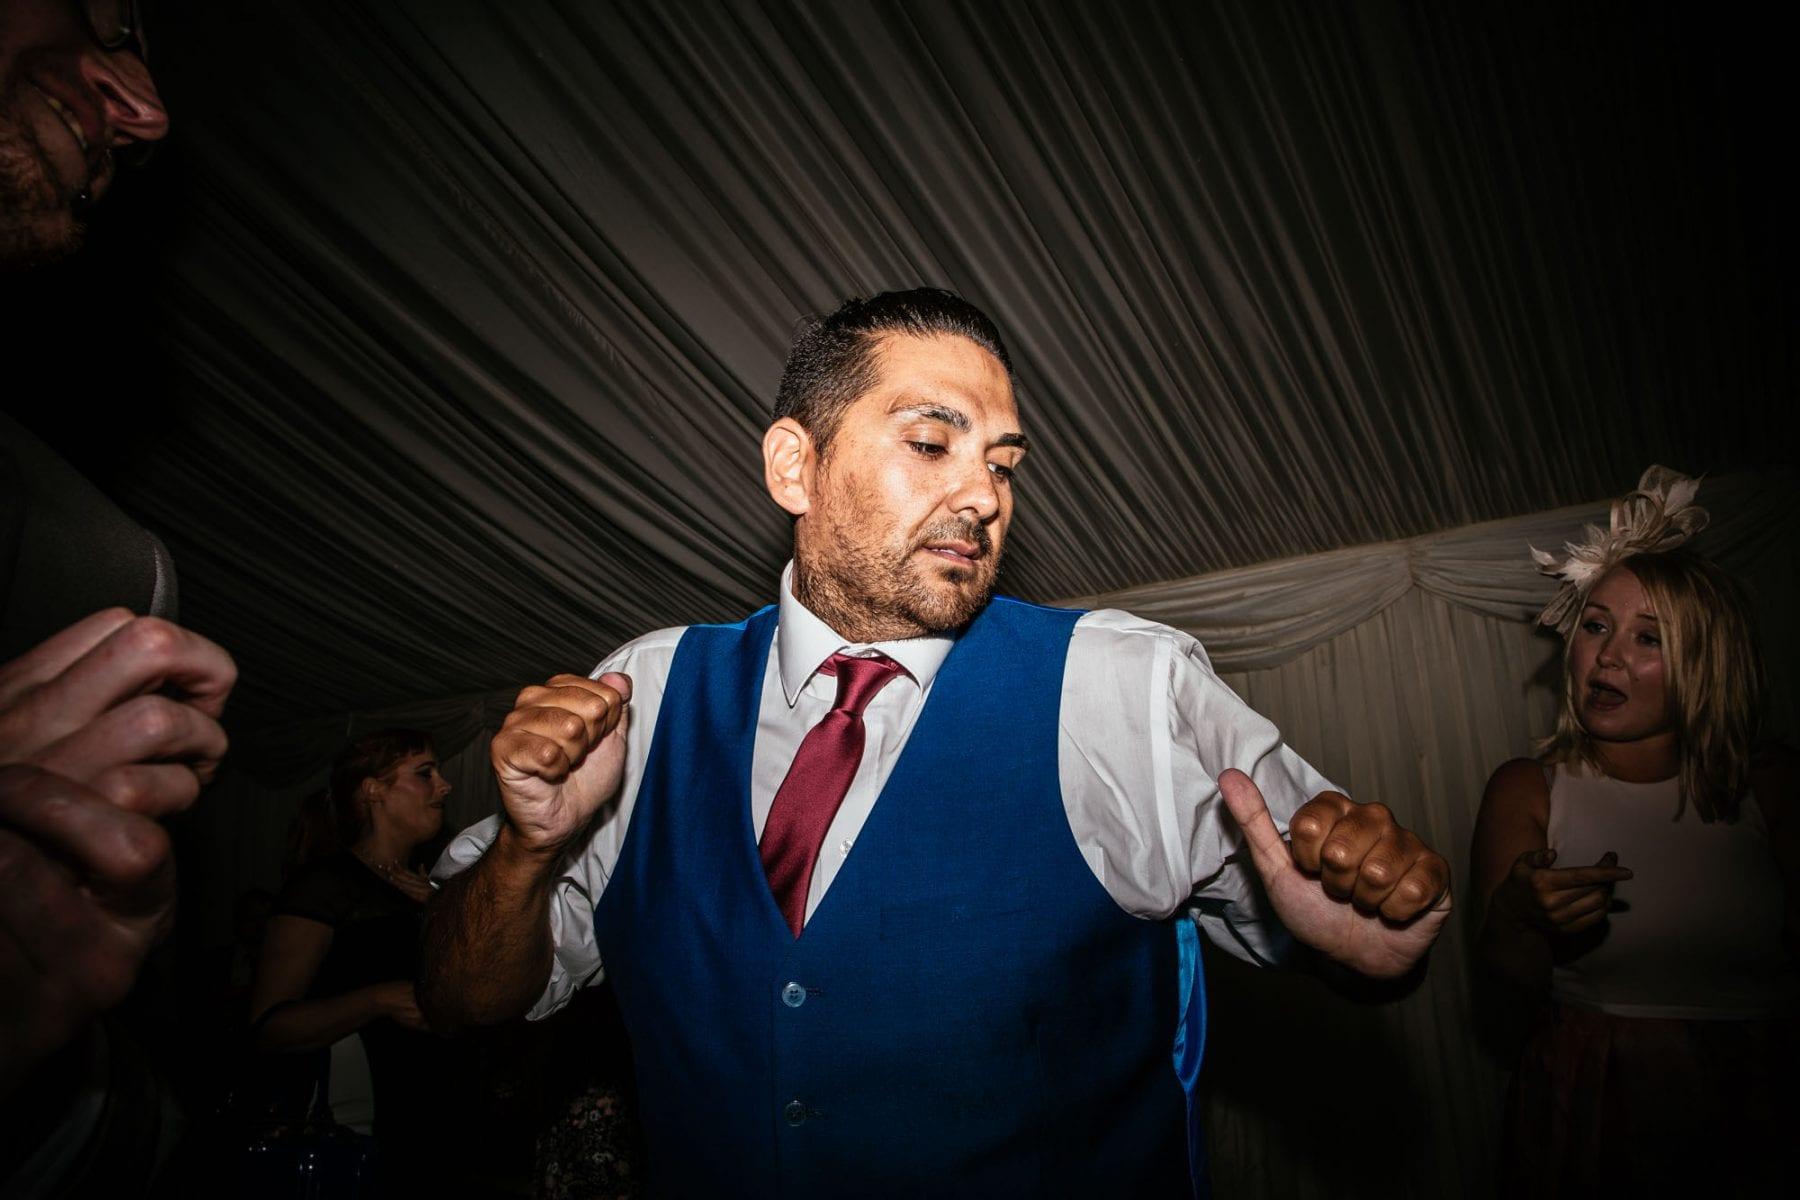 Dancing at Heaton House Farm